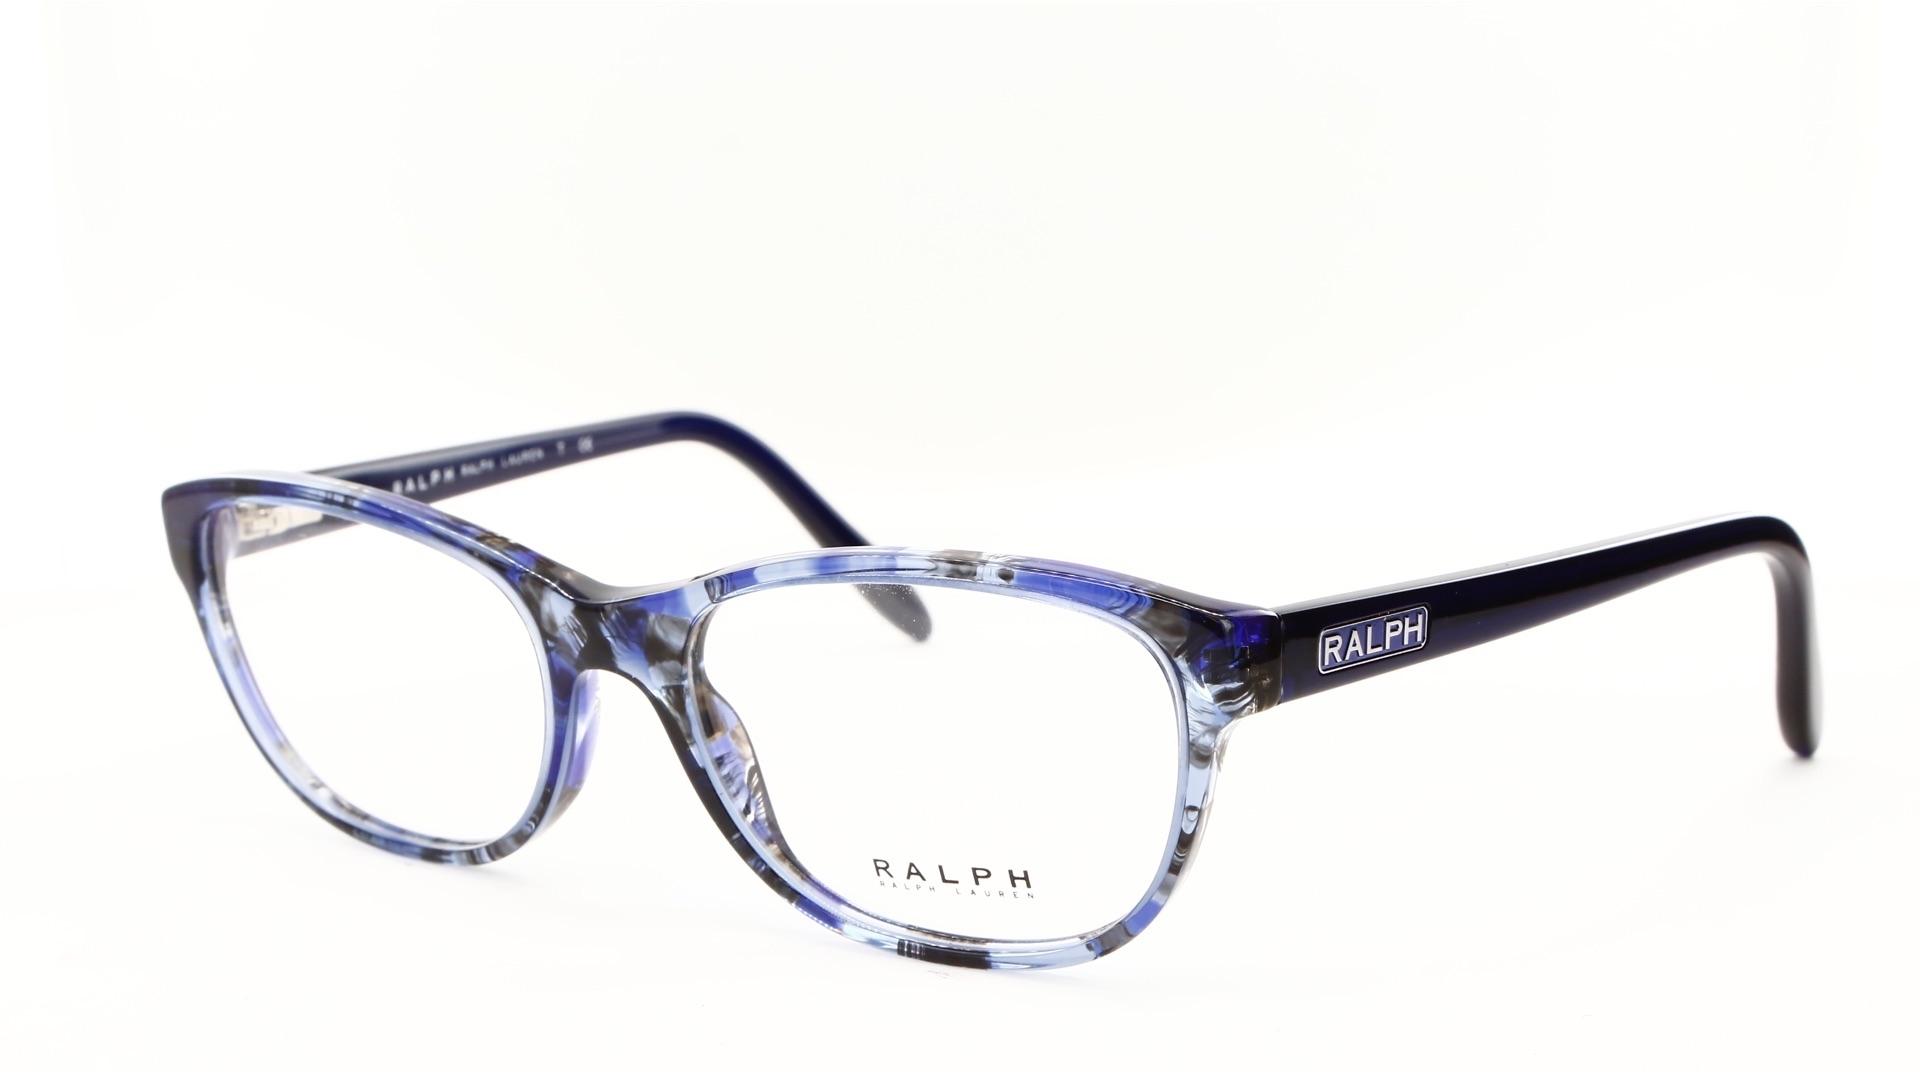 69536 | Polo Ralph Lauren Frames | Claeyssens Optic | Brugge & Gent